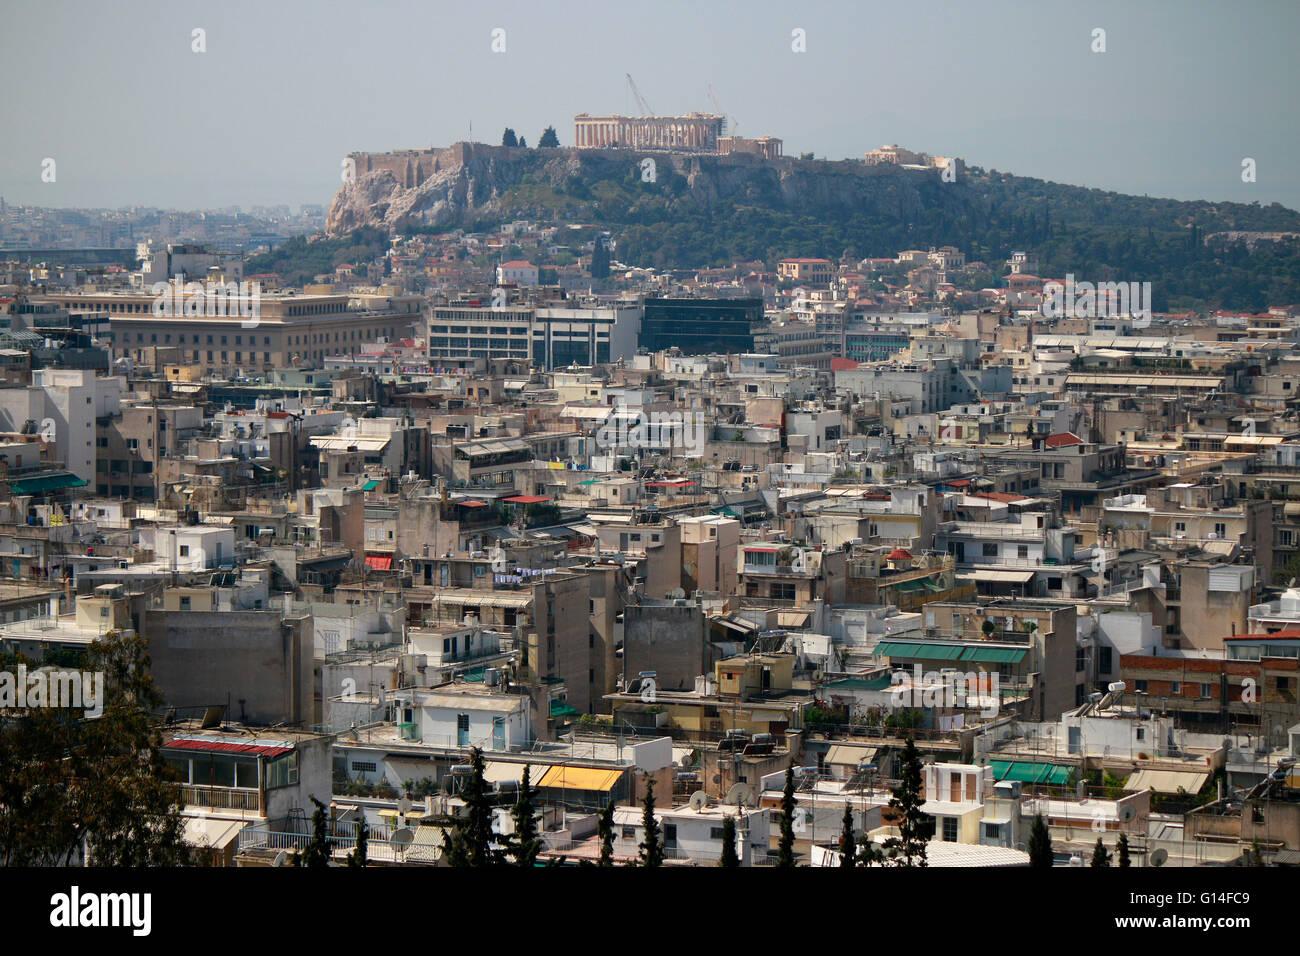 Akropolis, Athen, Griechenland. Stock Photo